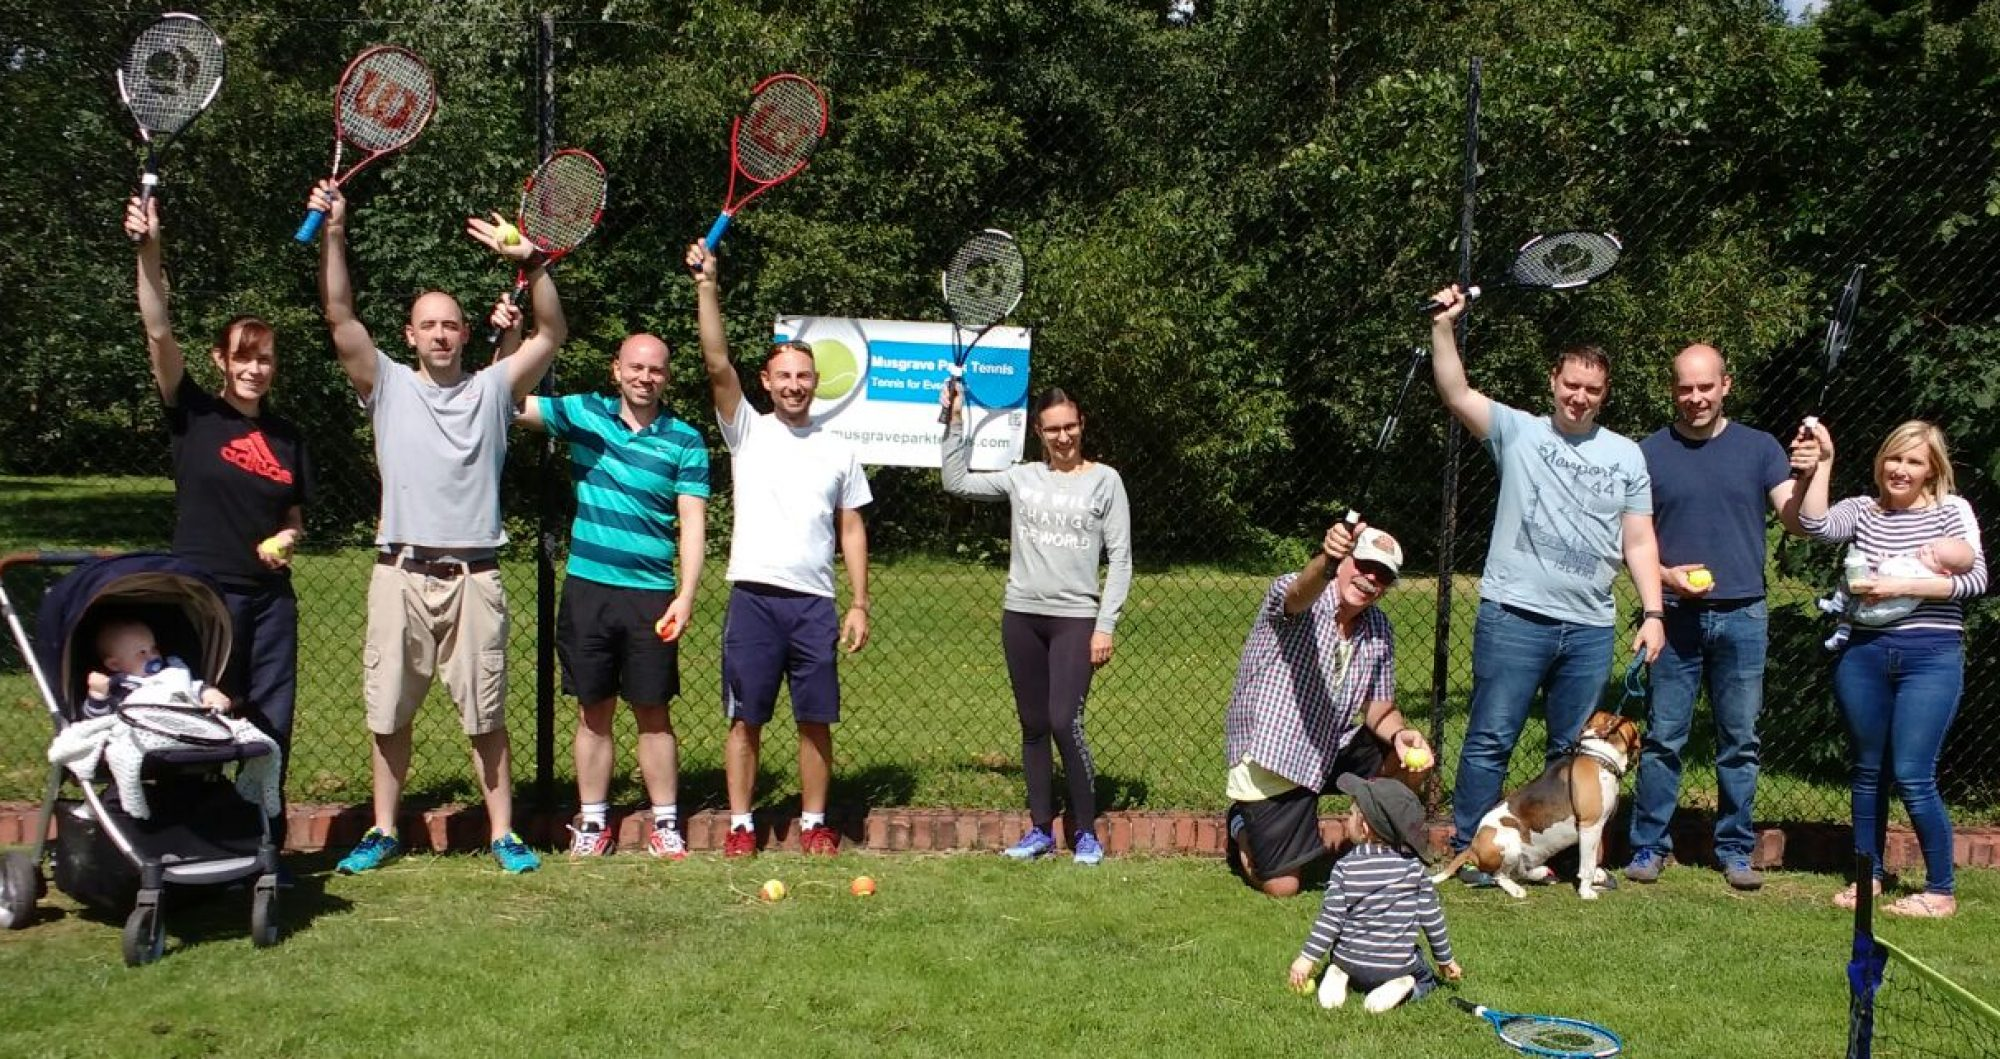 Musgrave Park Tennis